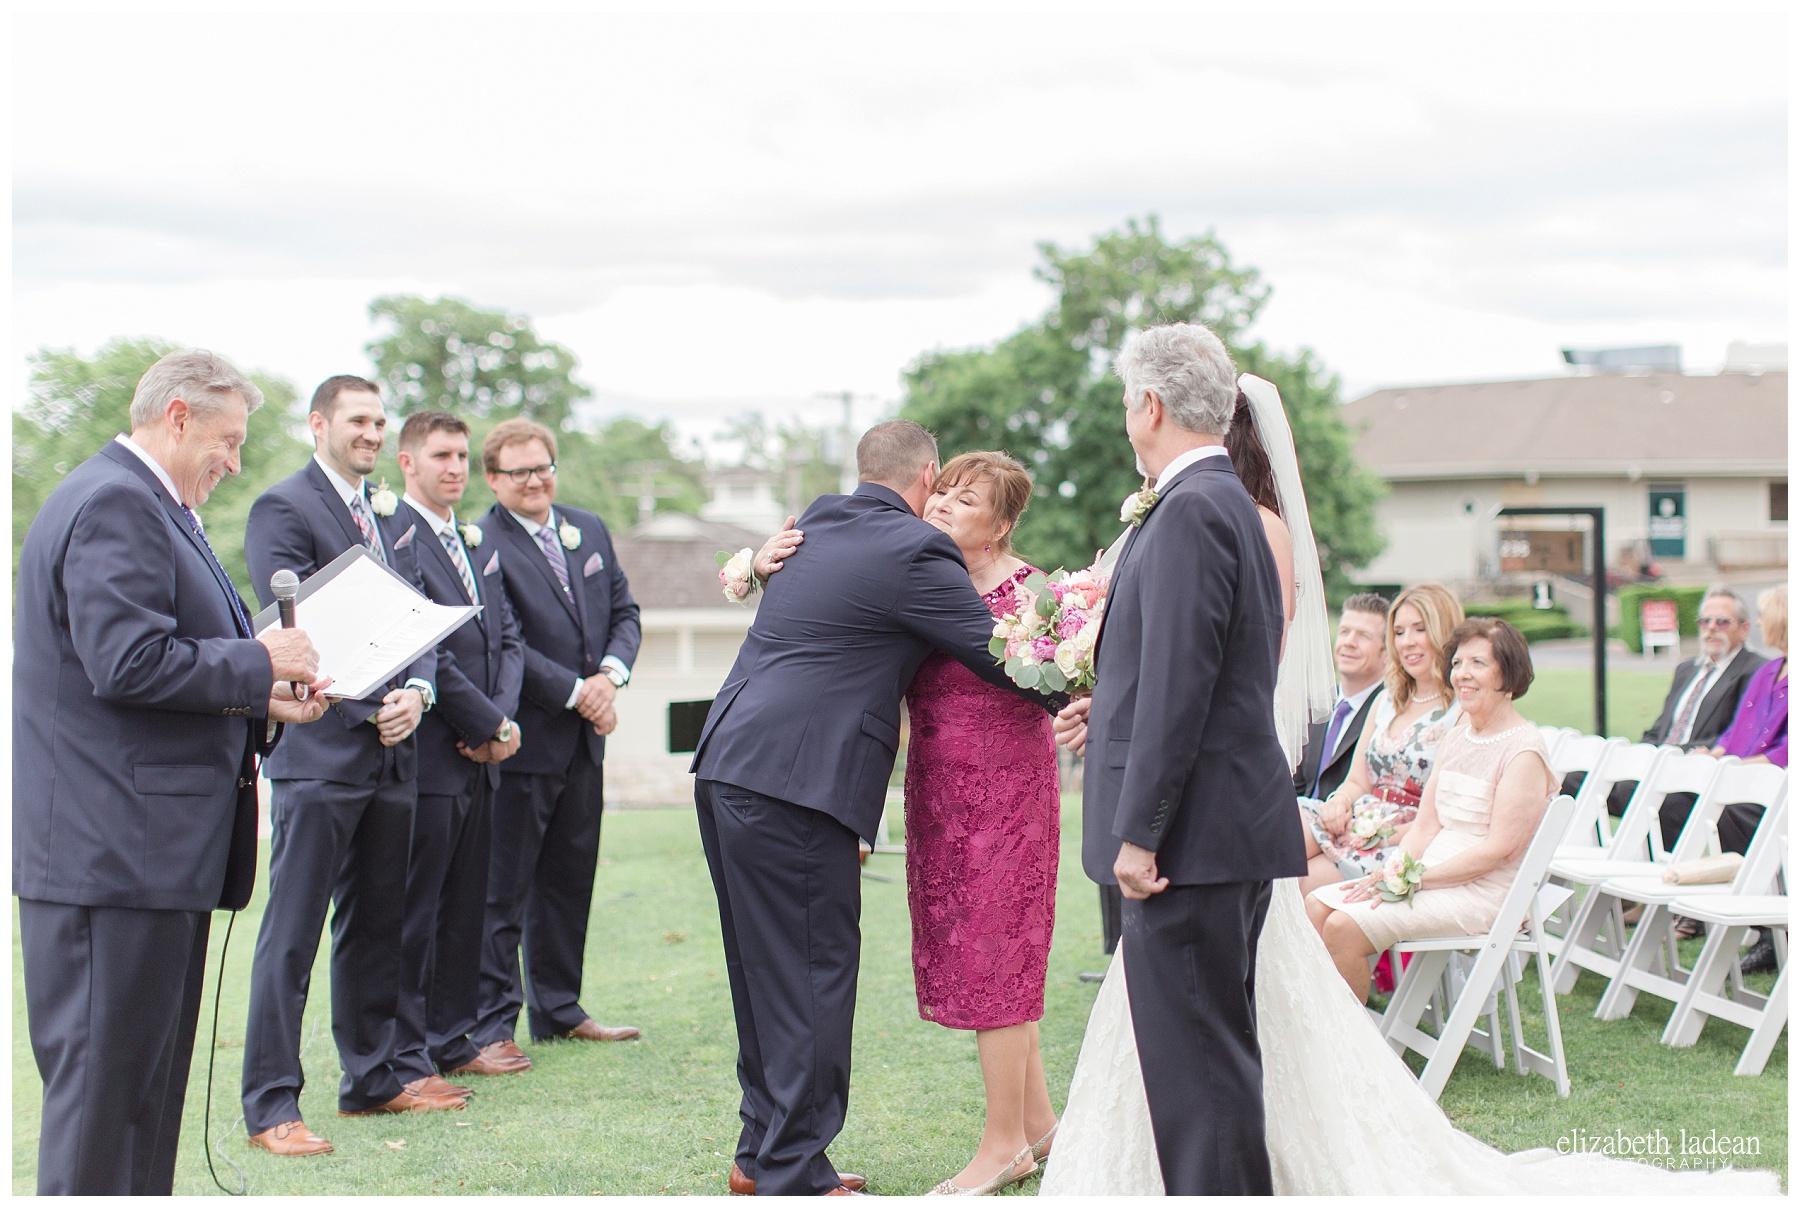 Hillcrest-Country-Club-Kansas-City-Wedding-Photography-E+J-0520-Elizabeth-Ladean-Photography-photo_0838.jpg